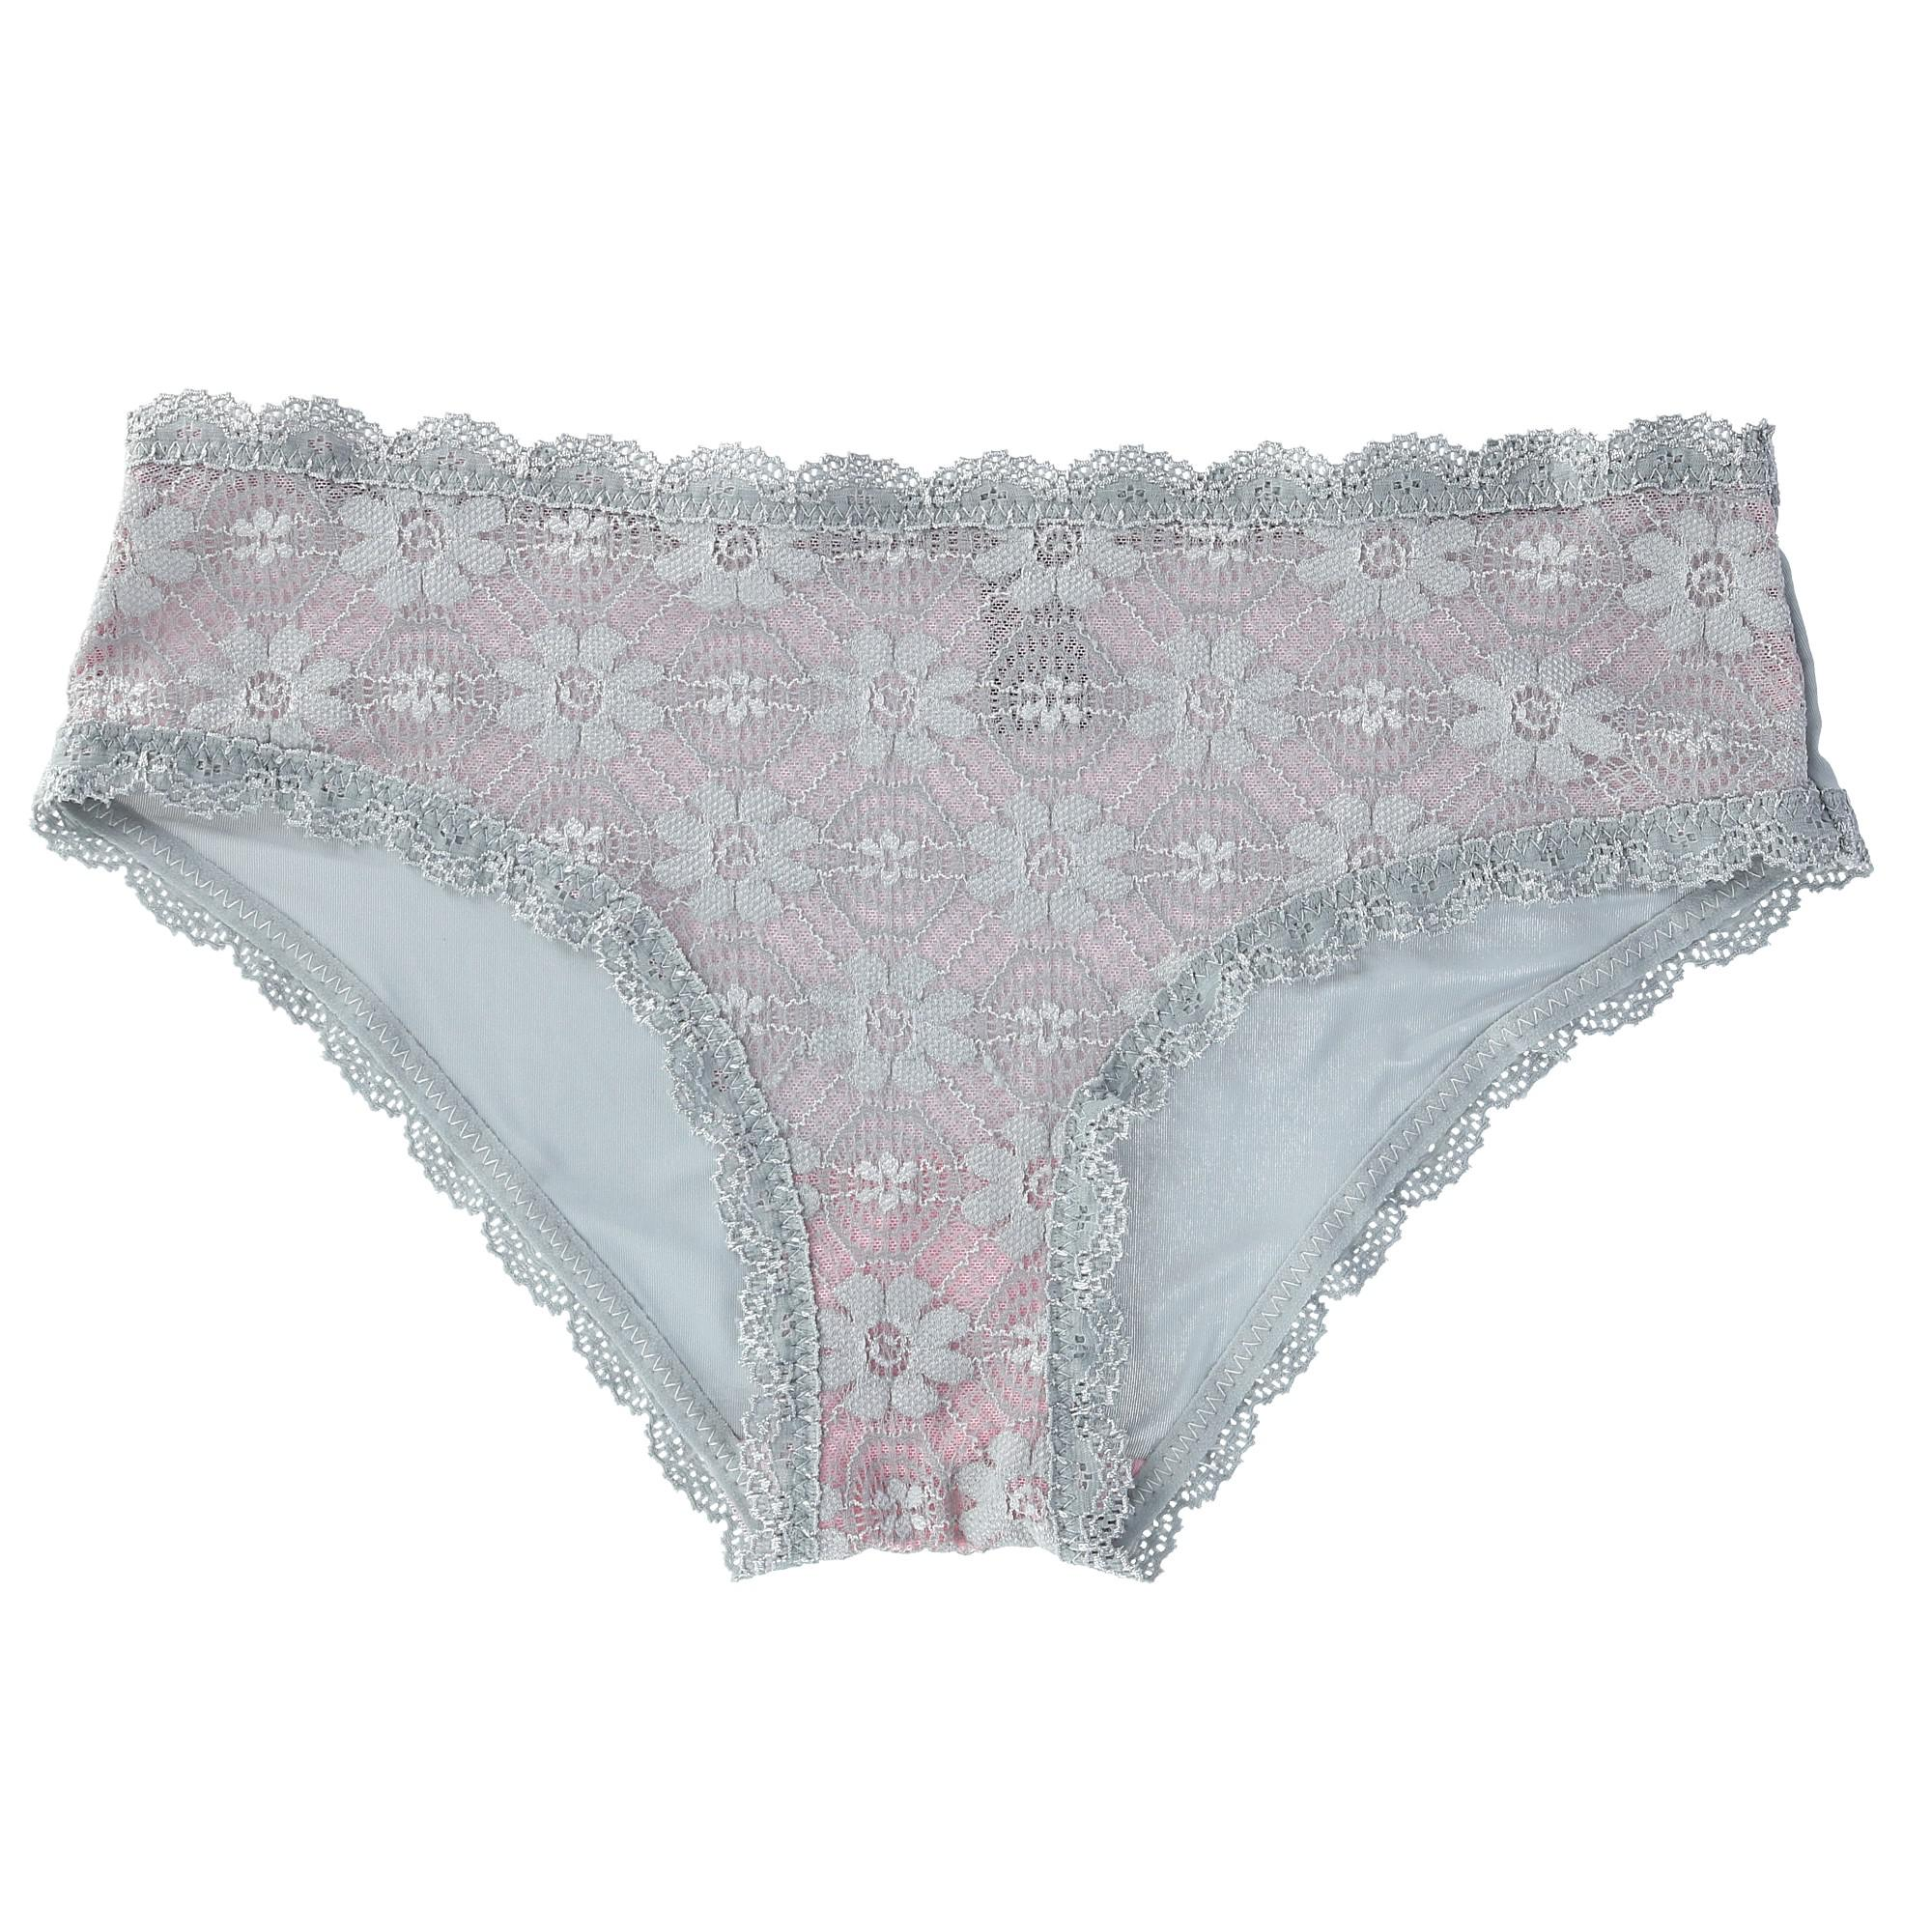 3b369da4f923 New Rene Rofe Women's Lace Hipster Underwear (Pack of 2)   eBay